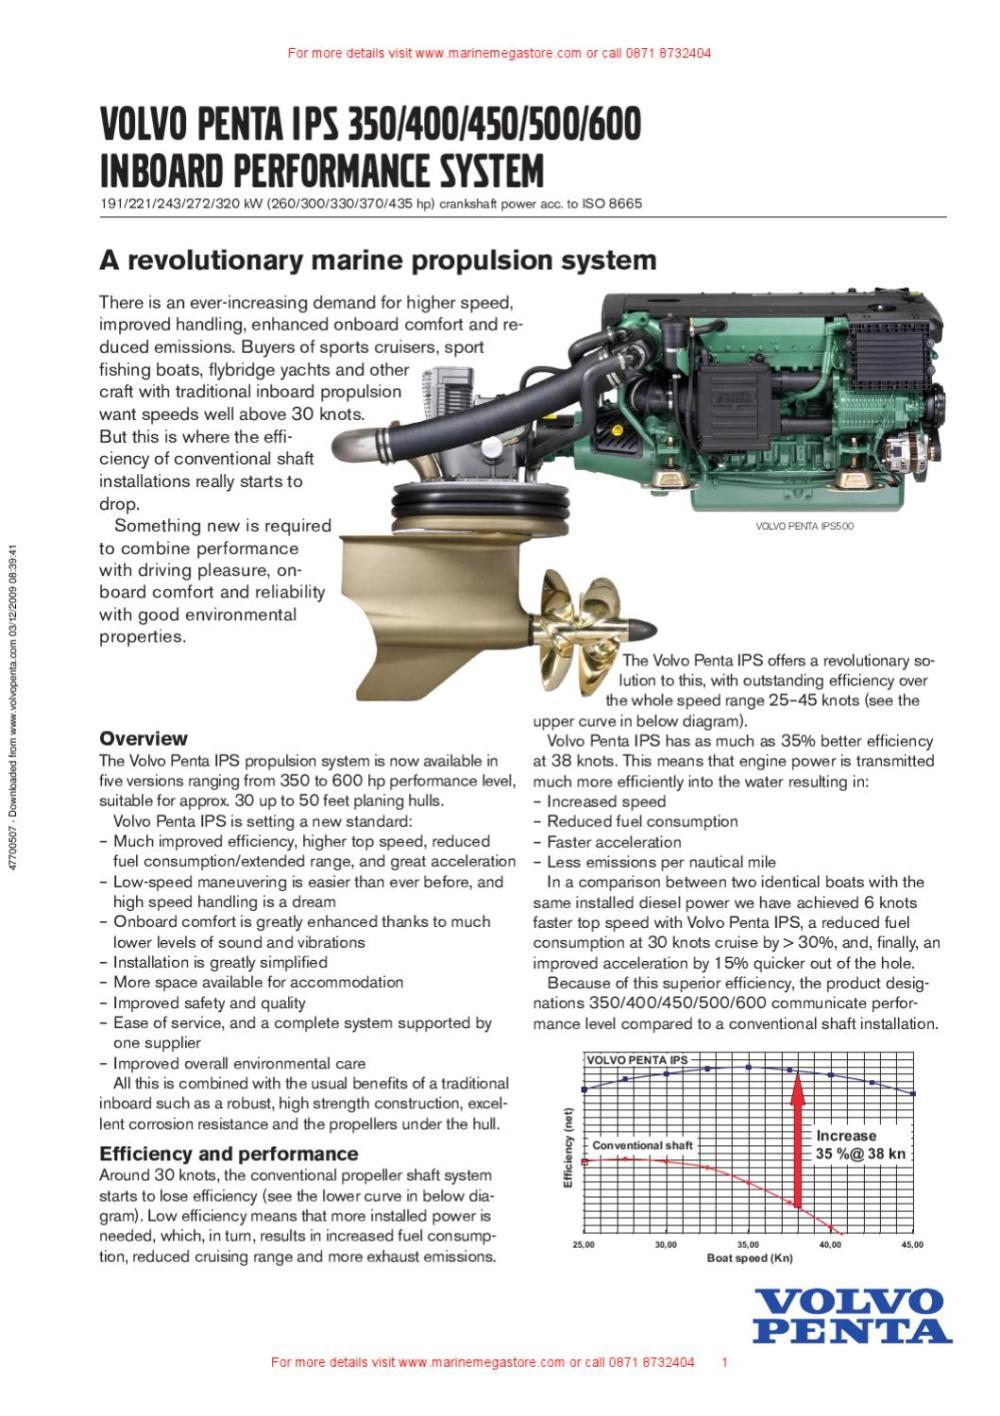 medium resolution of volvo penta europe volvo penta ips 350 400 450 500 600 brochure by marine mega store ltd issuu